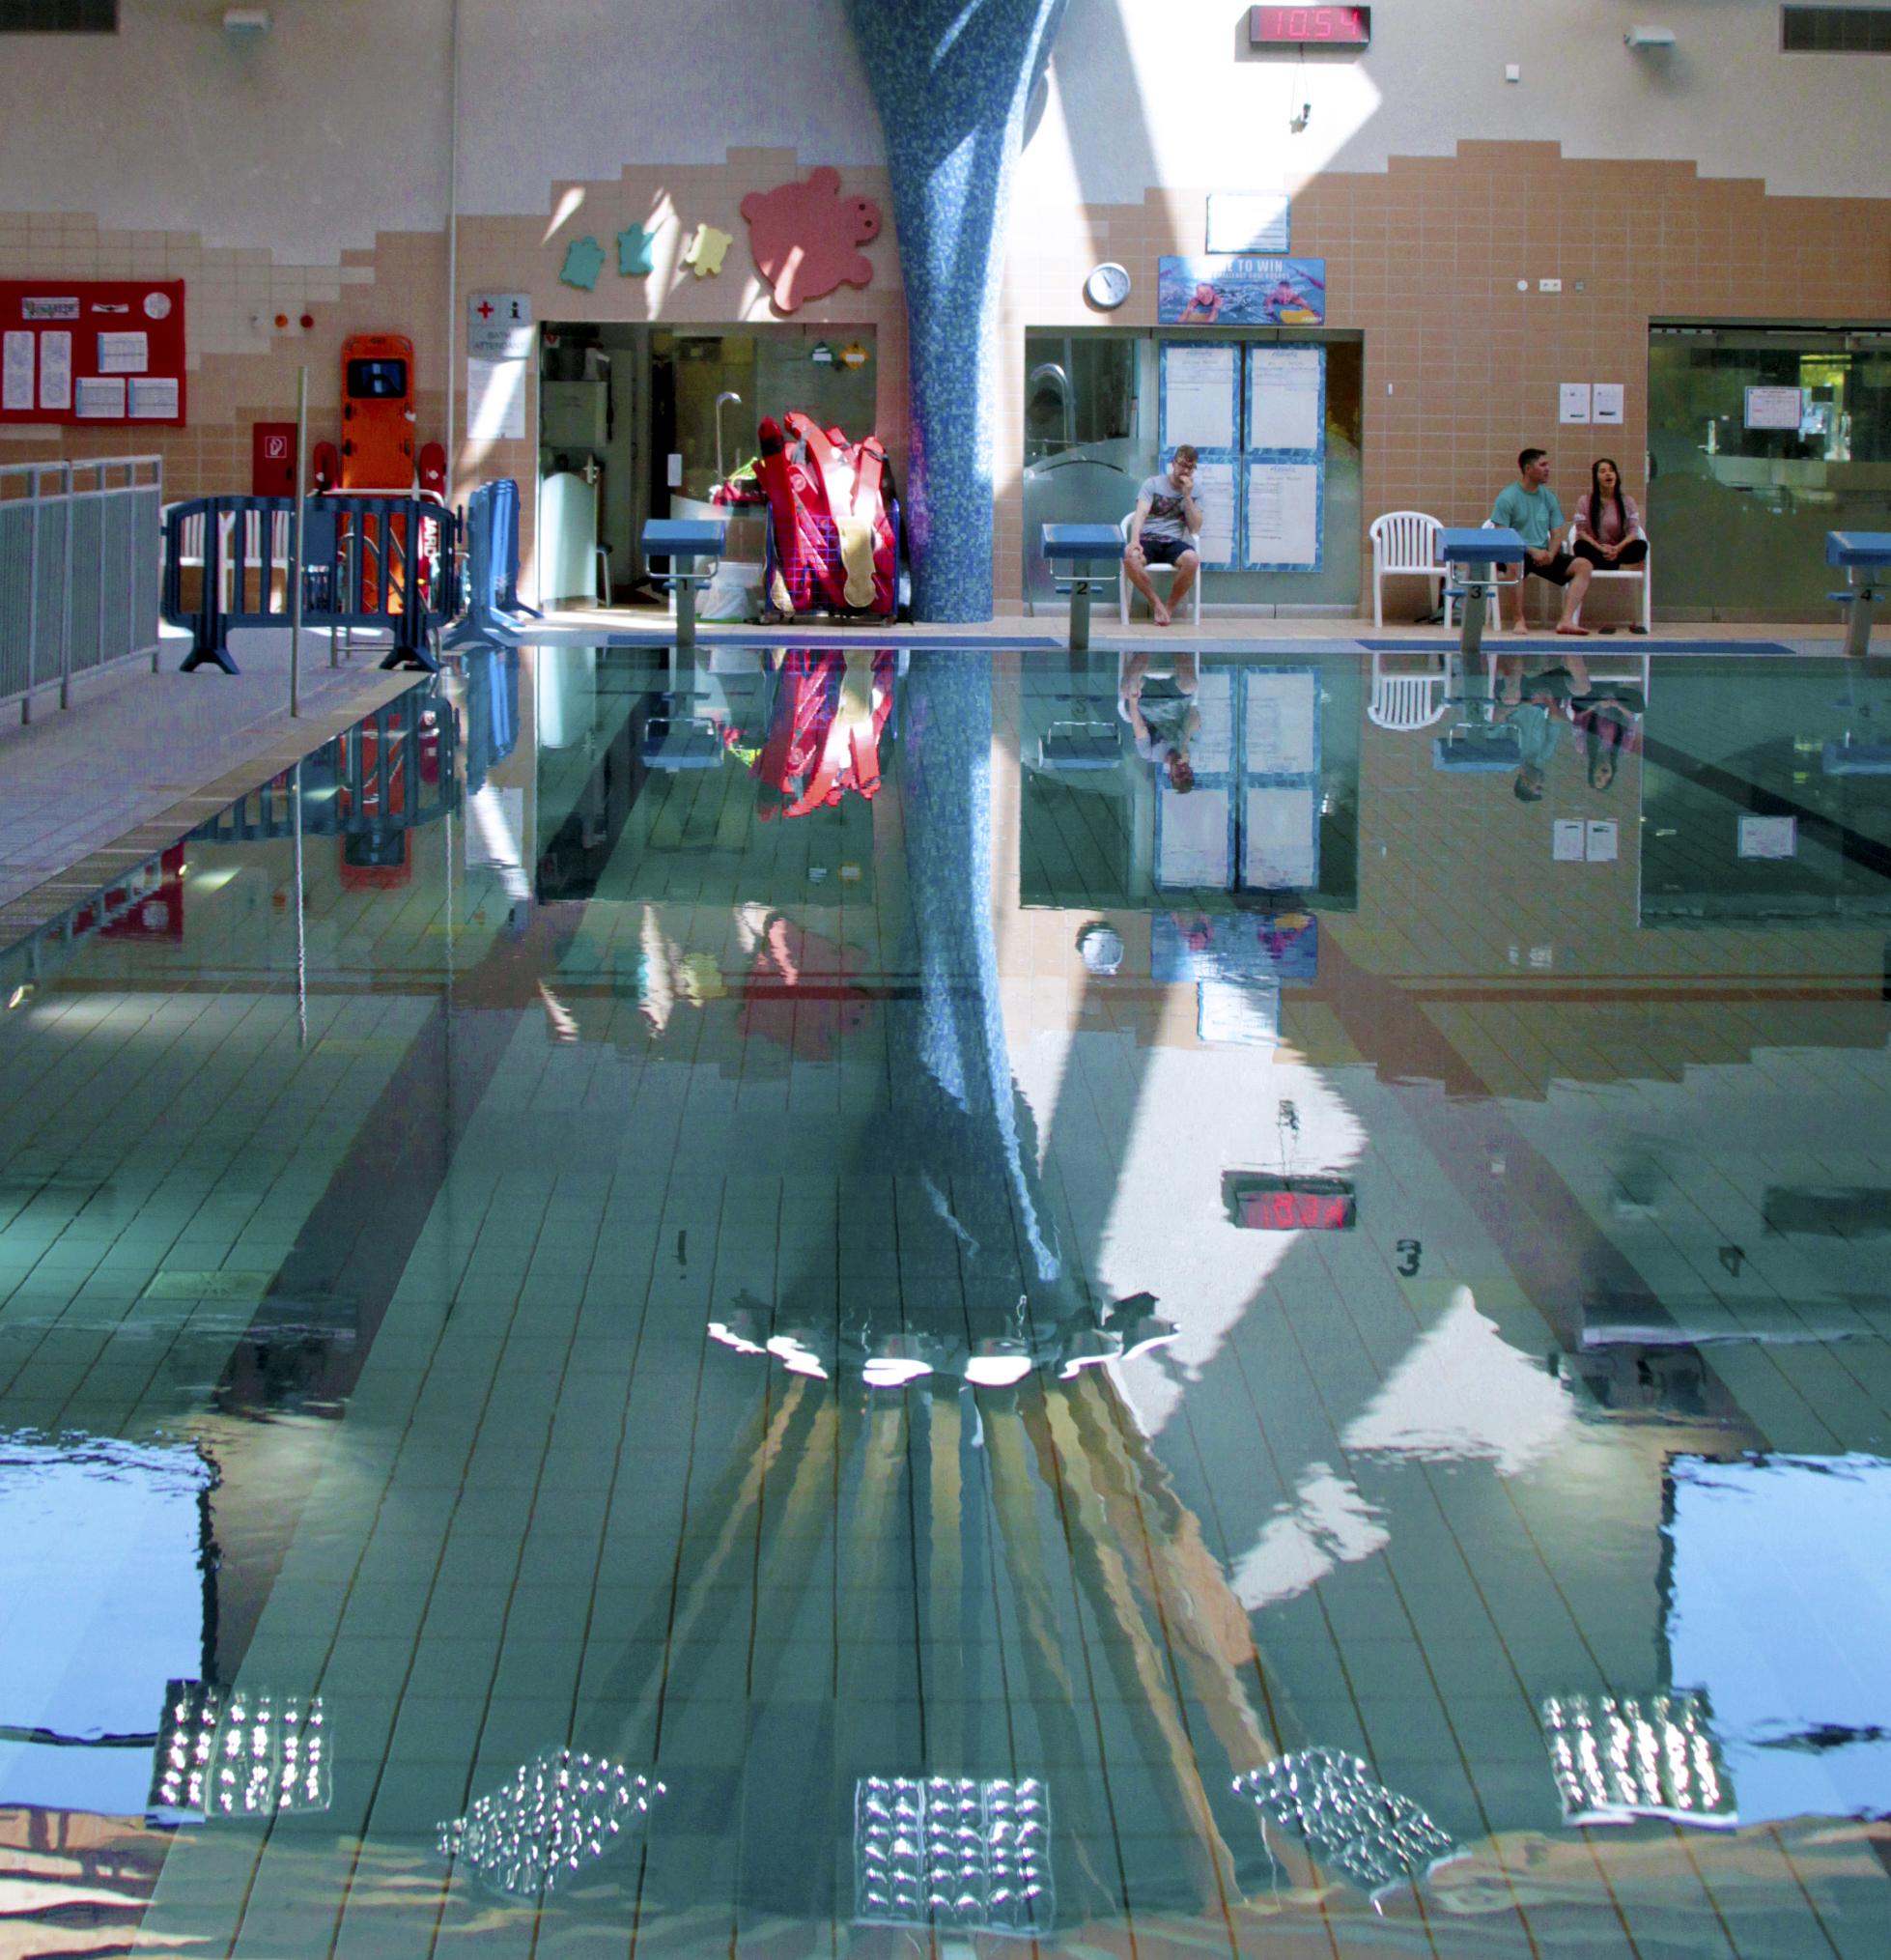 Aquatic center 86 fss - Indoor swimming pool temperature regulations ...